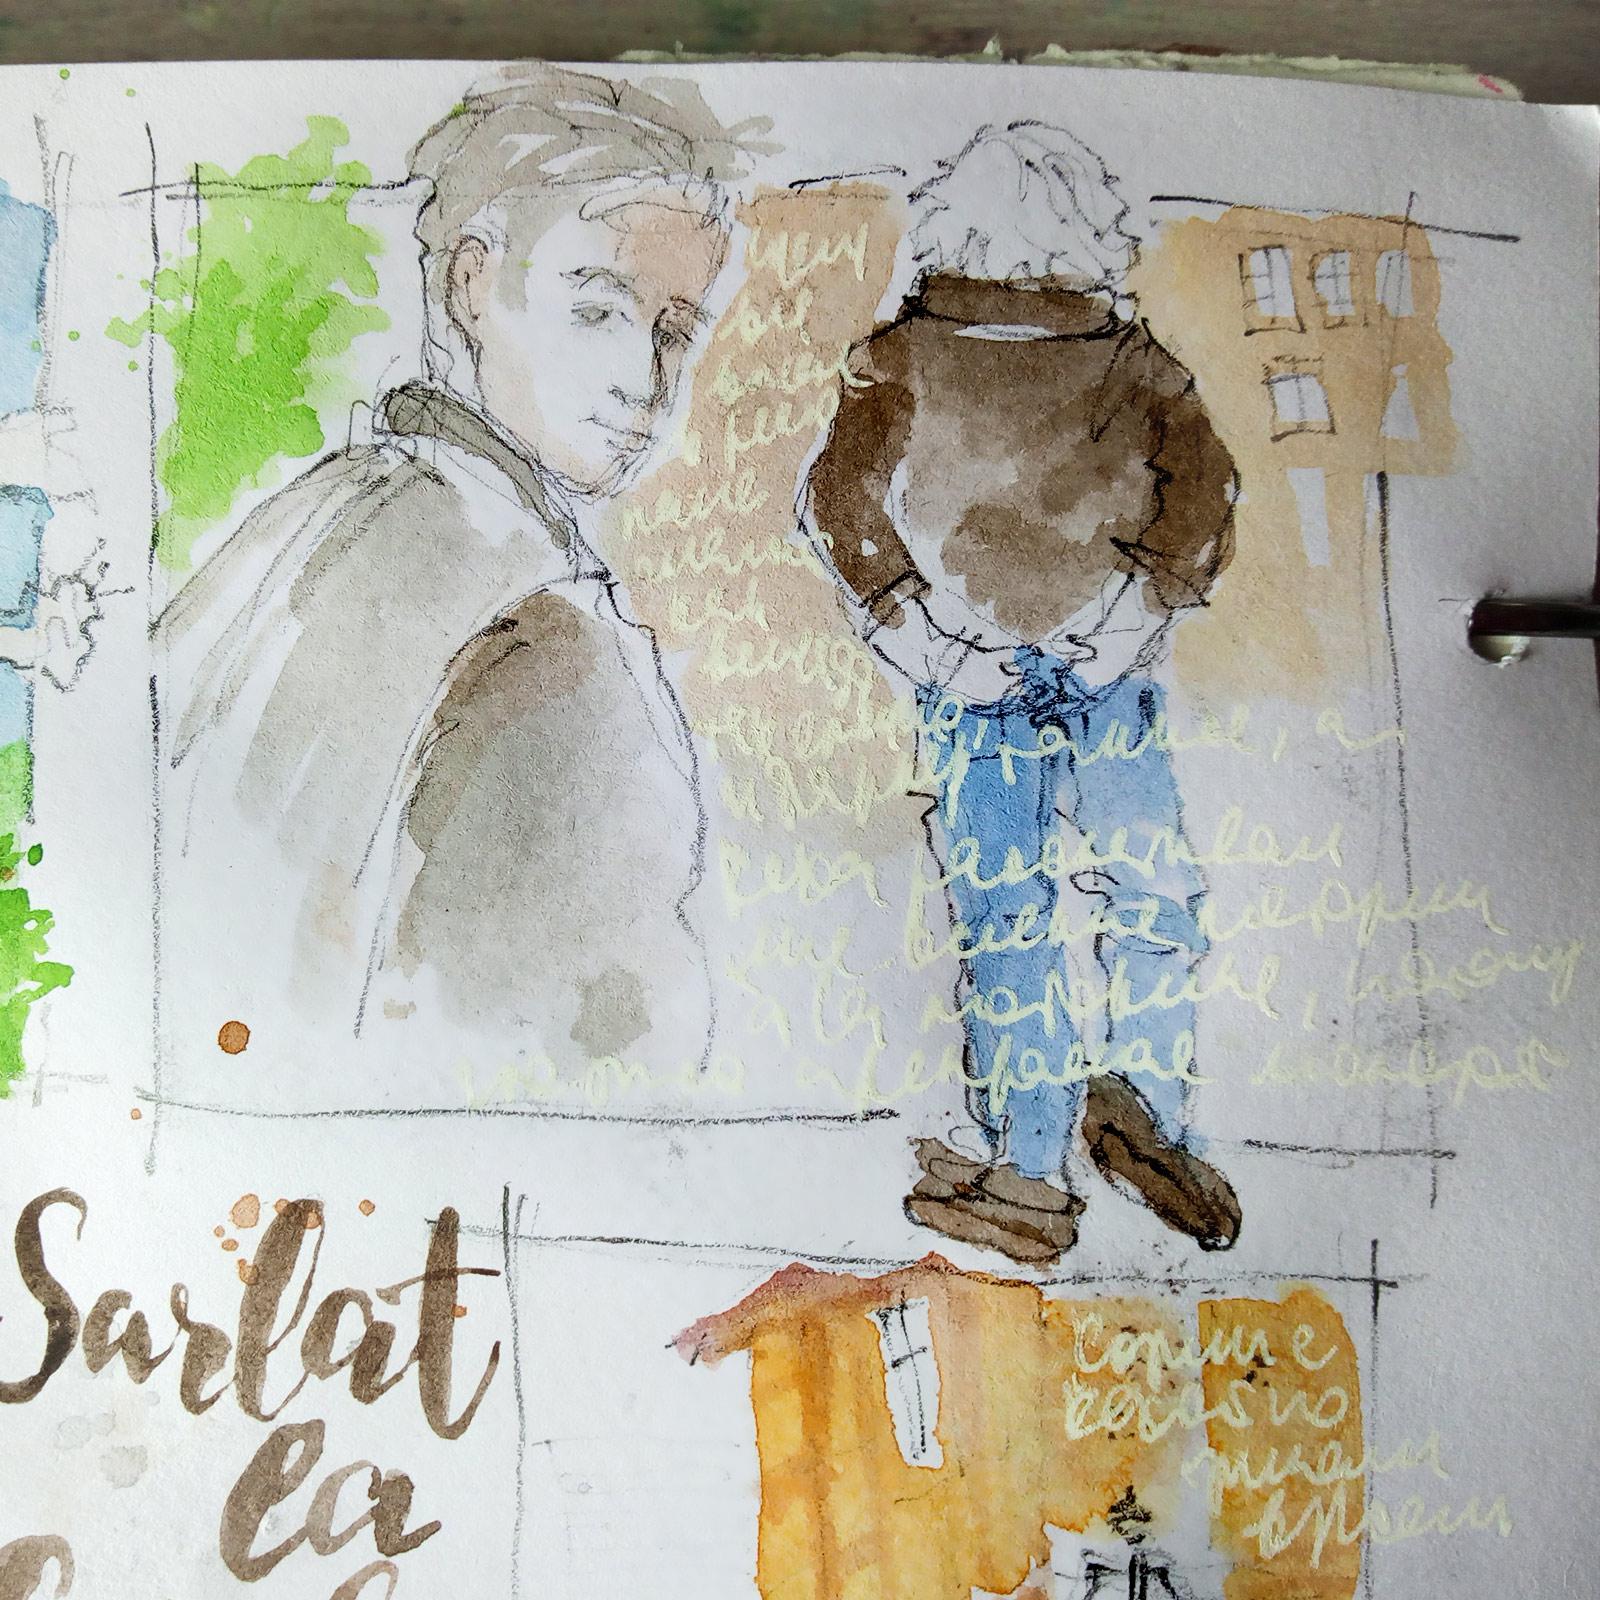 Sarlat-la-Caneda-sketch